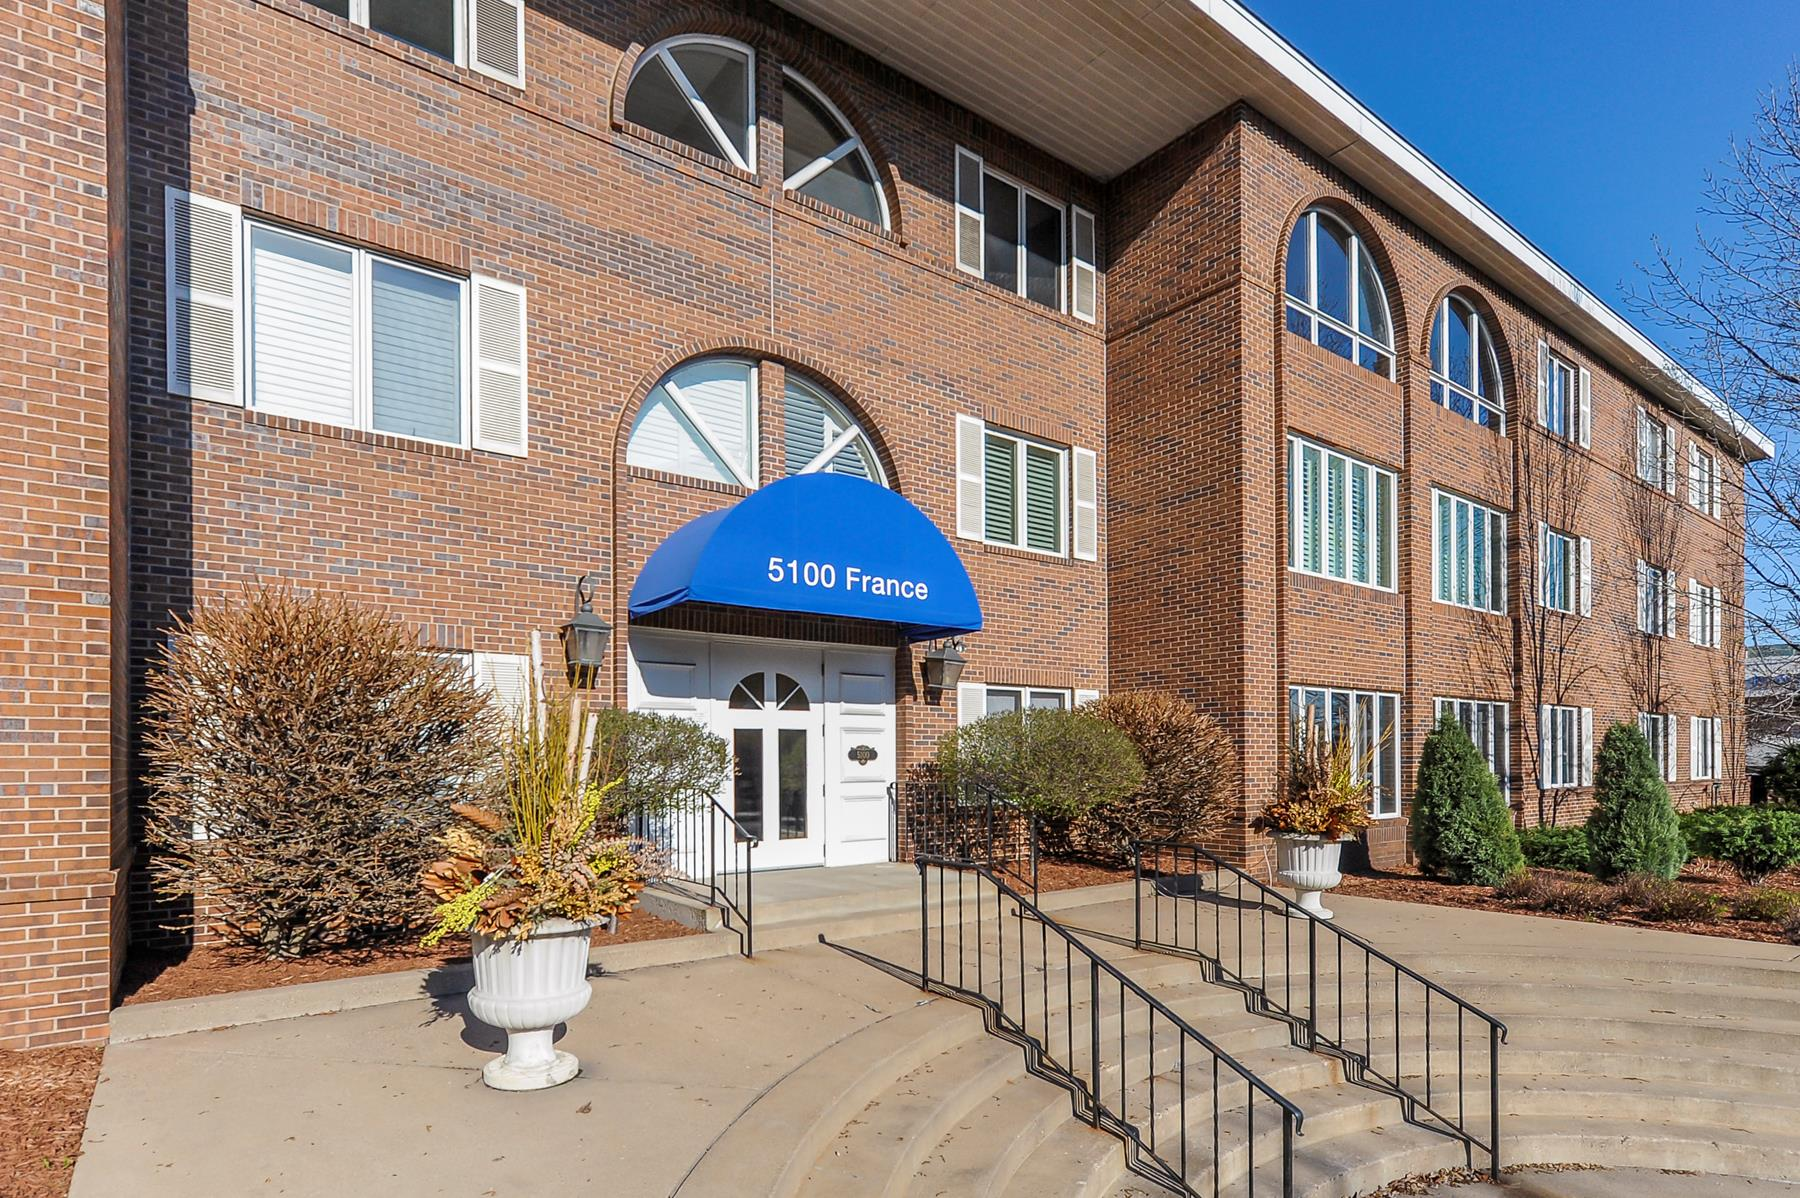 Condominium for Sale at 5100 France Avenue S #305 Edina, Minnesota, 55410 United States